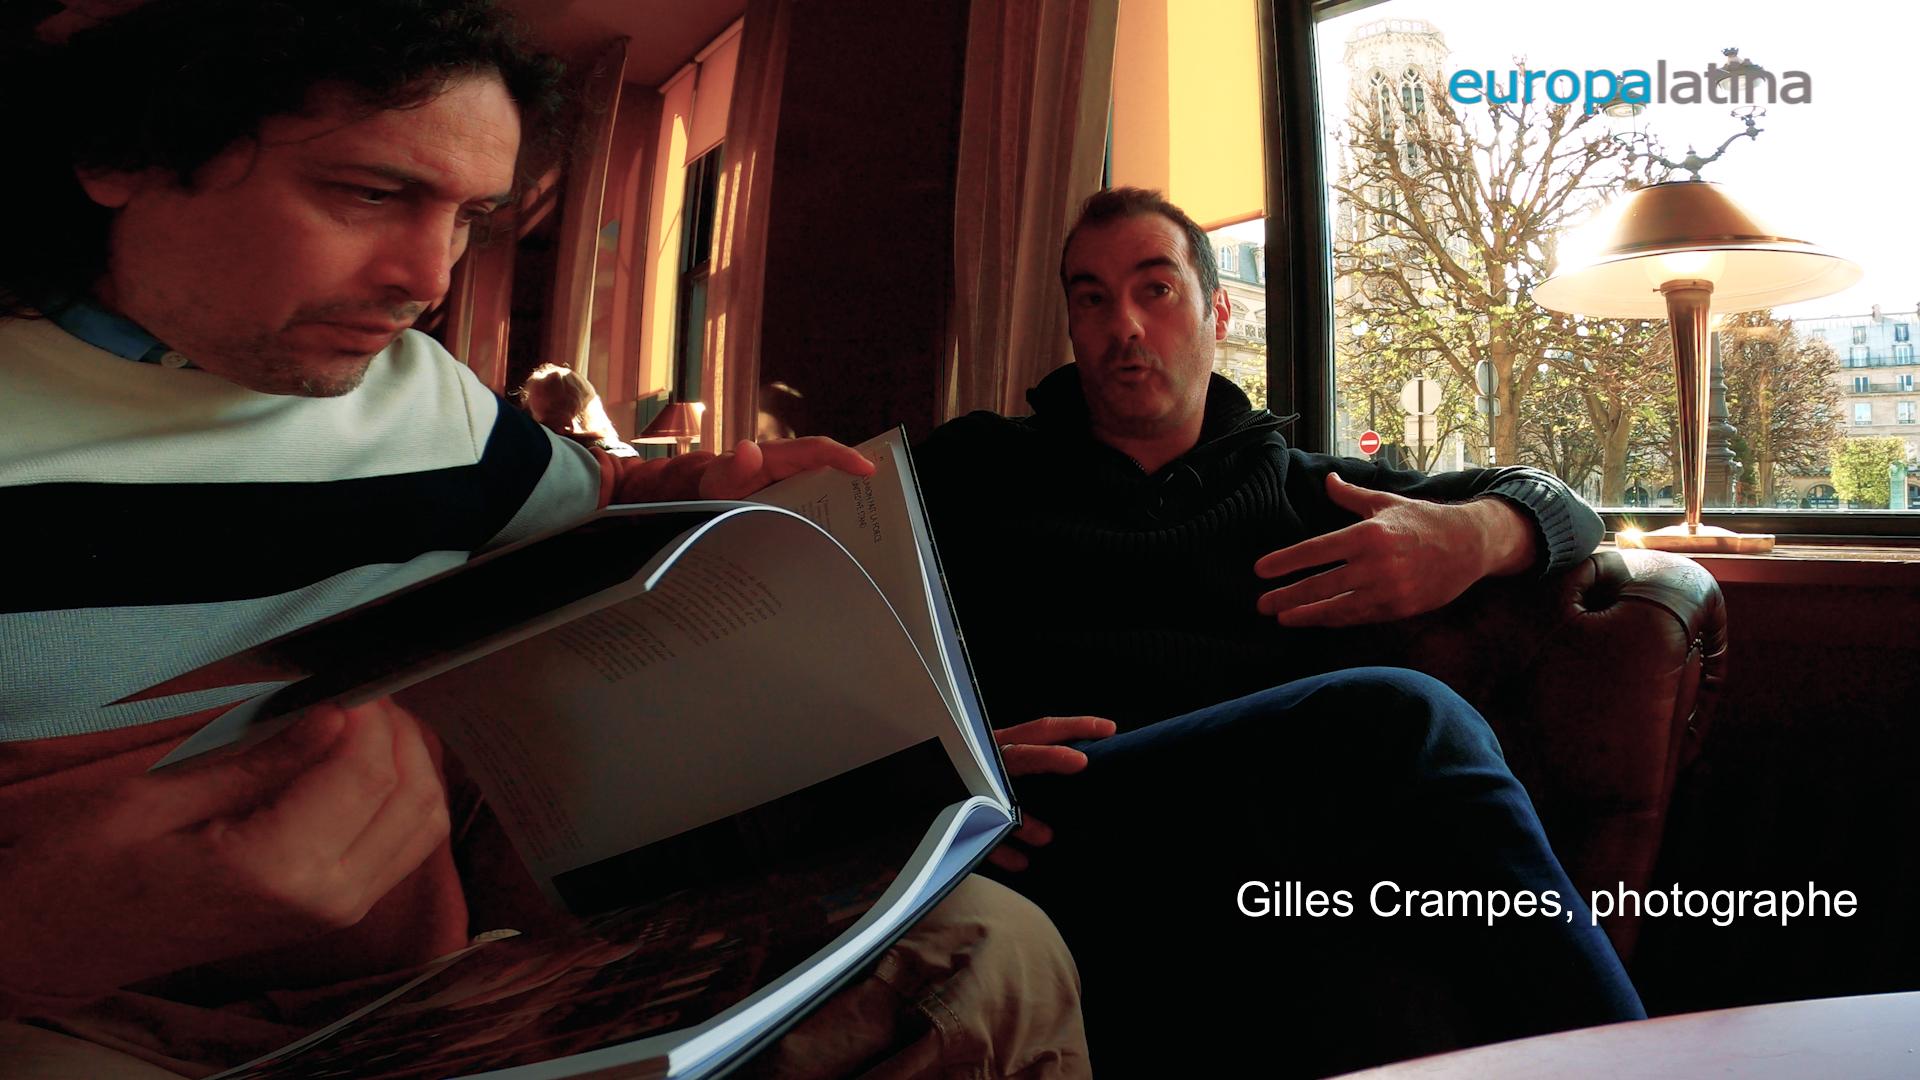 París Celebra, de Gilles Crampes